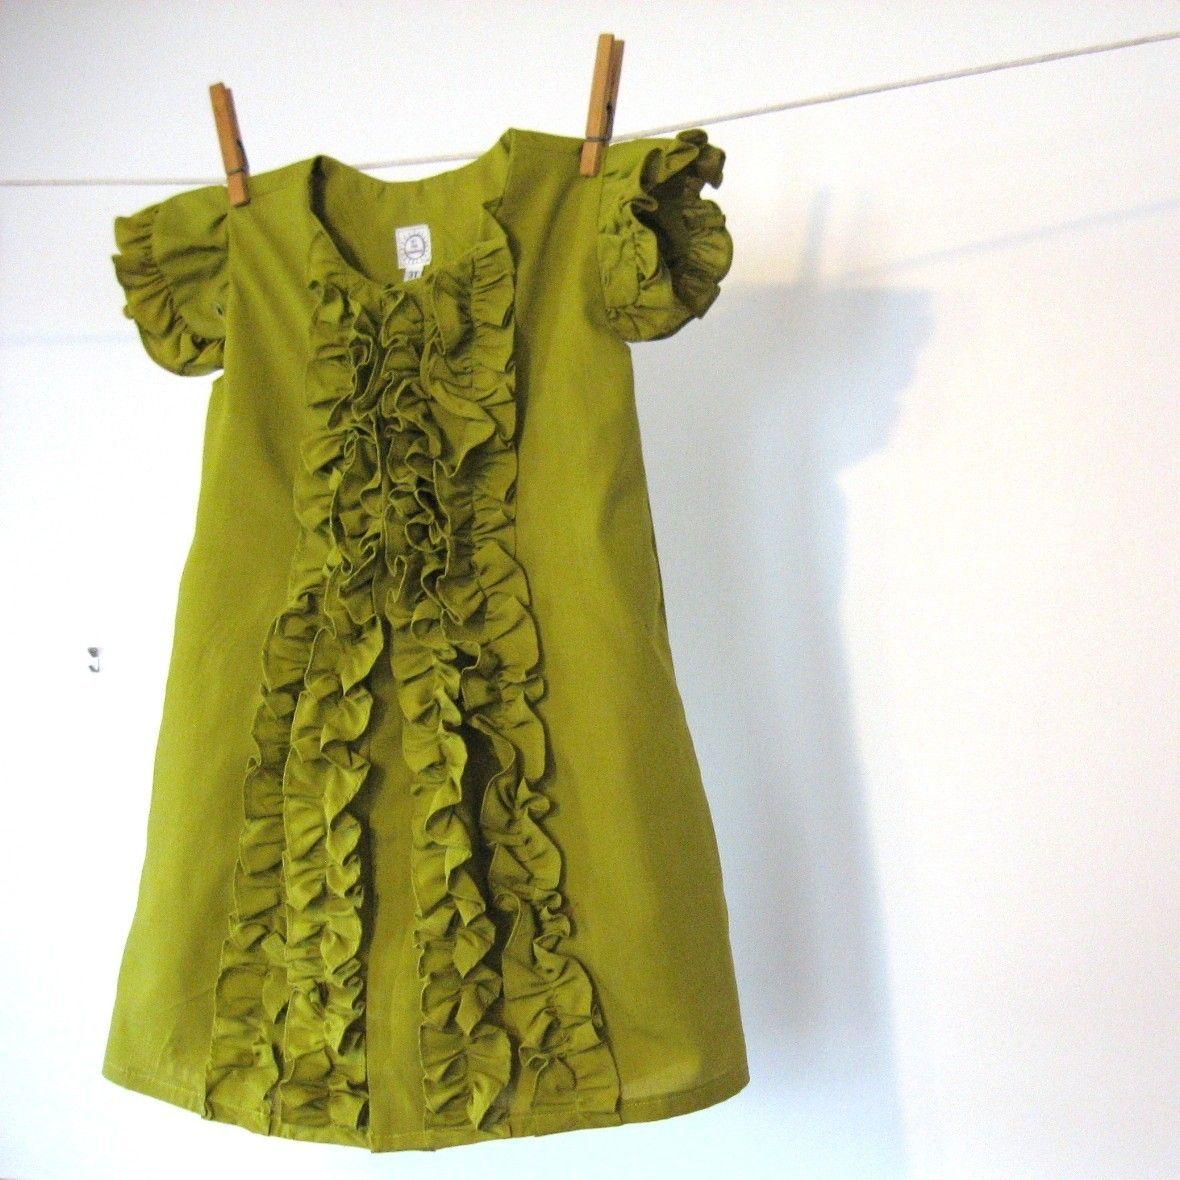 Yellow dress shirt men  cuuuuuuuuute  baby girl booger butt  Pinterest  Shirt tutorial